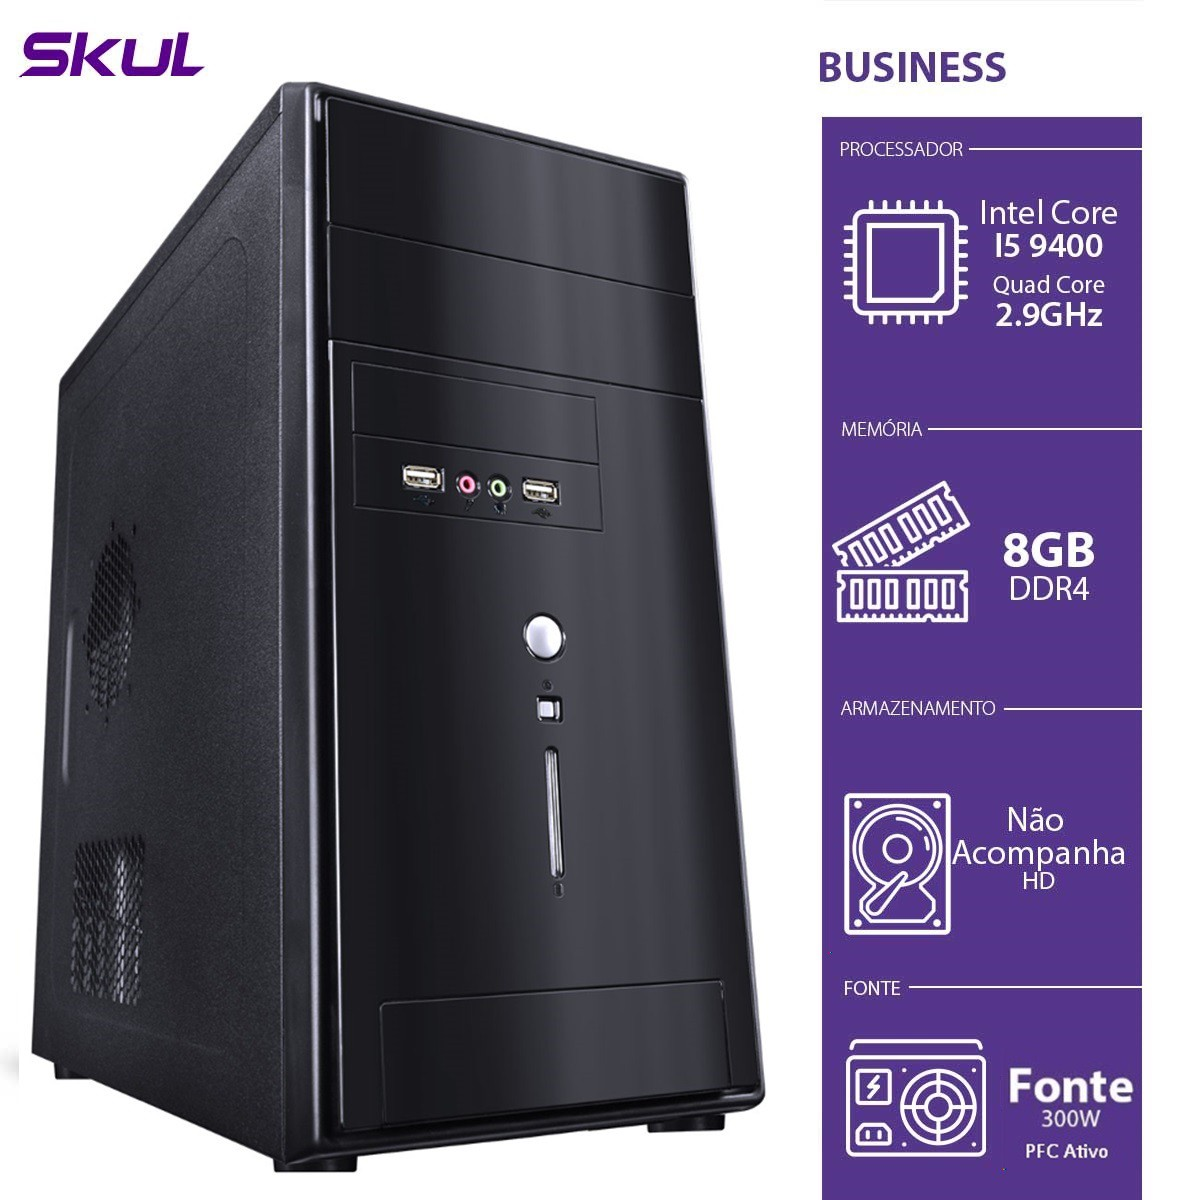 Computador Business B500 - I5-9400 2.9GHZ 8GB DDR4 sem HD/SSD HDMI/VGA Fonte 300W PFC Ativo